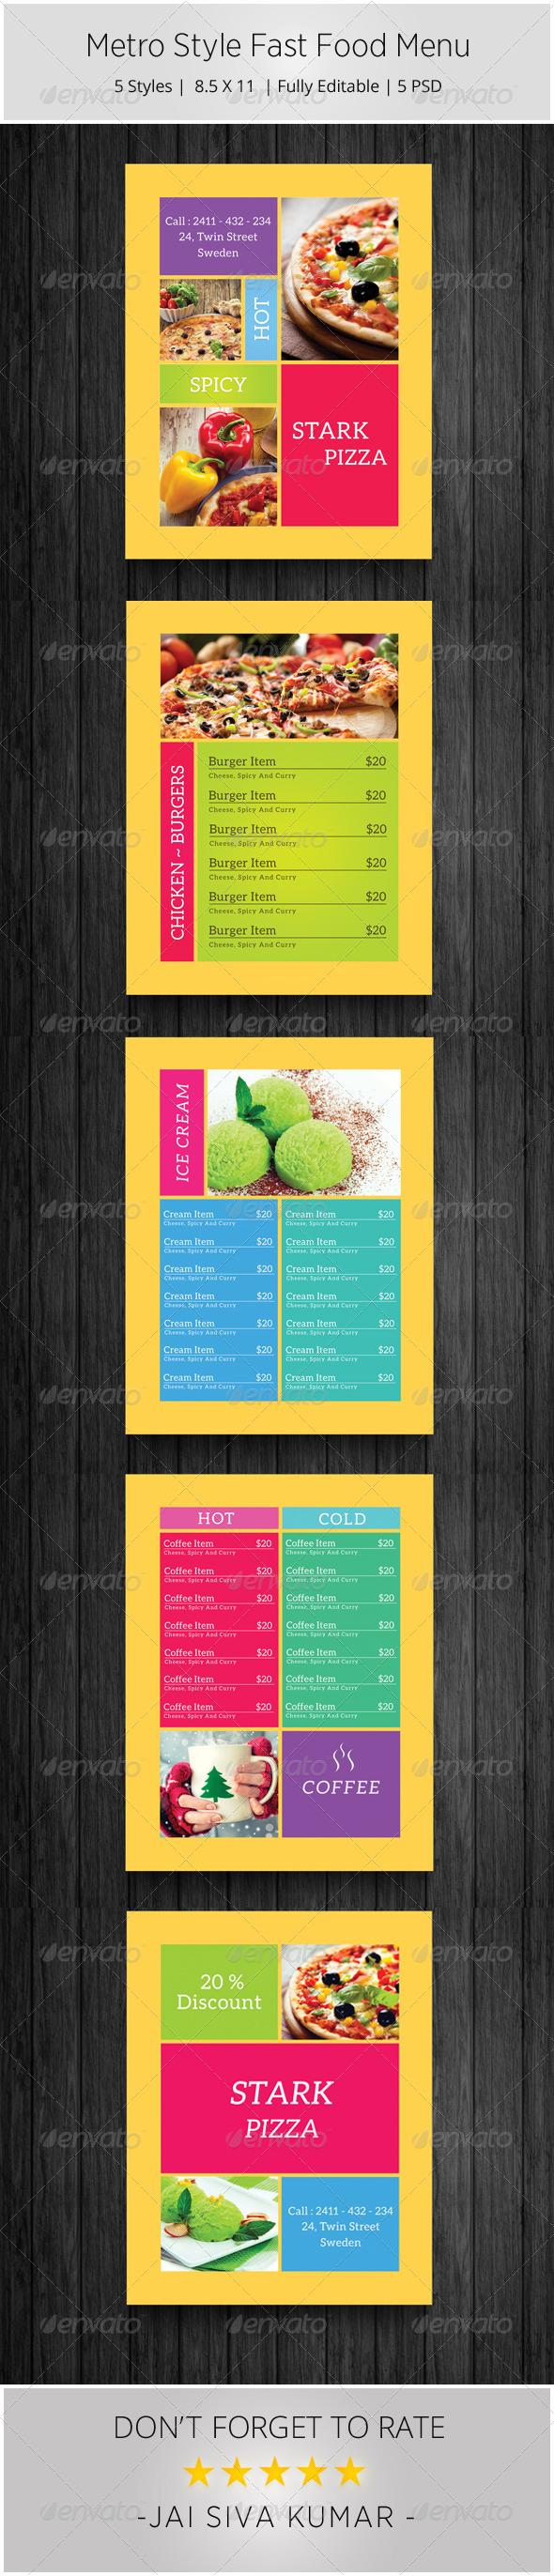 Metro Style Fast Food Menu - Food Menus Print Templates